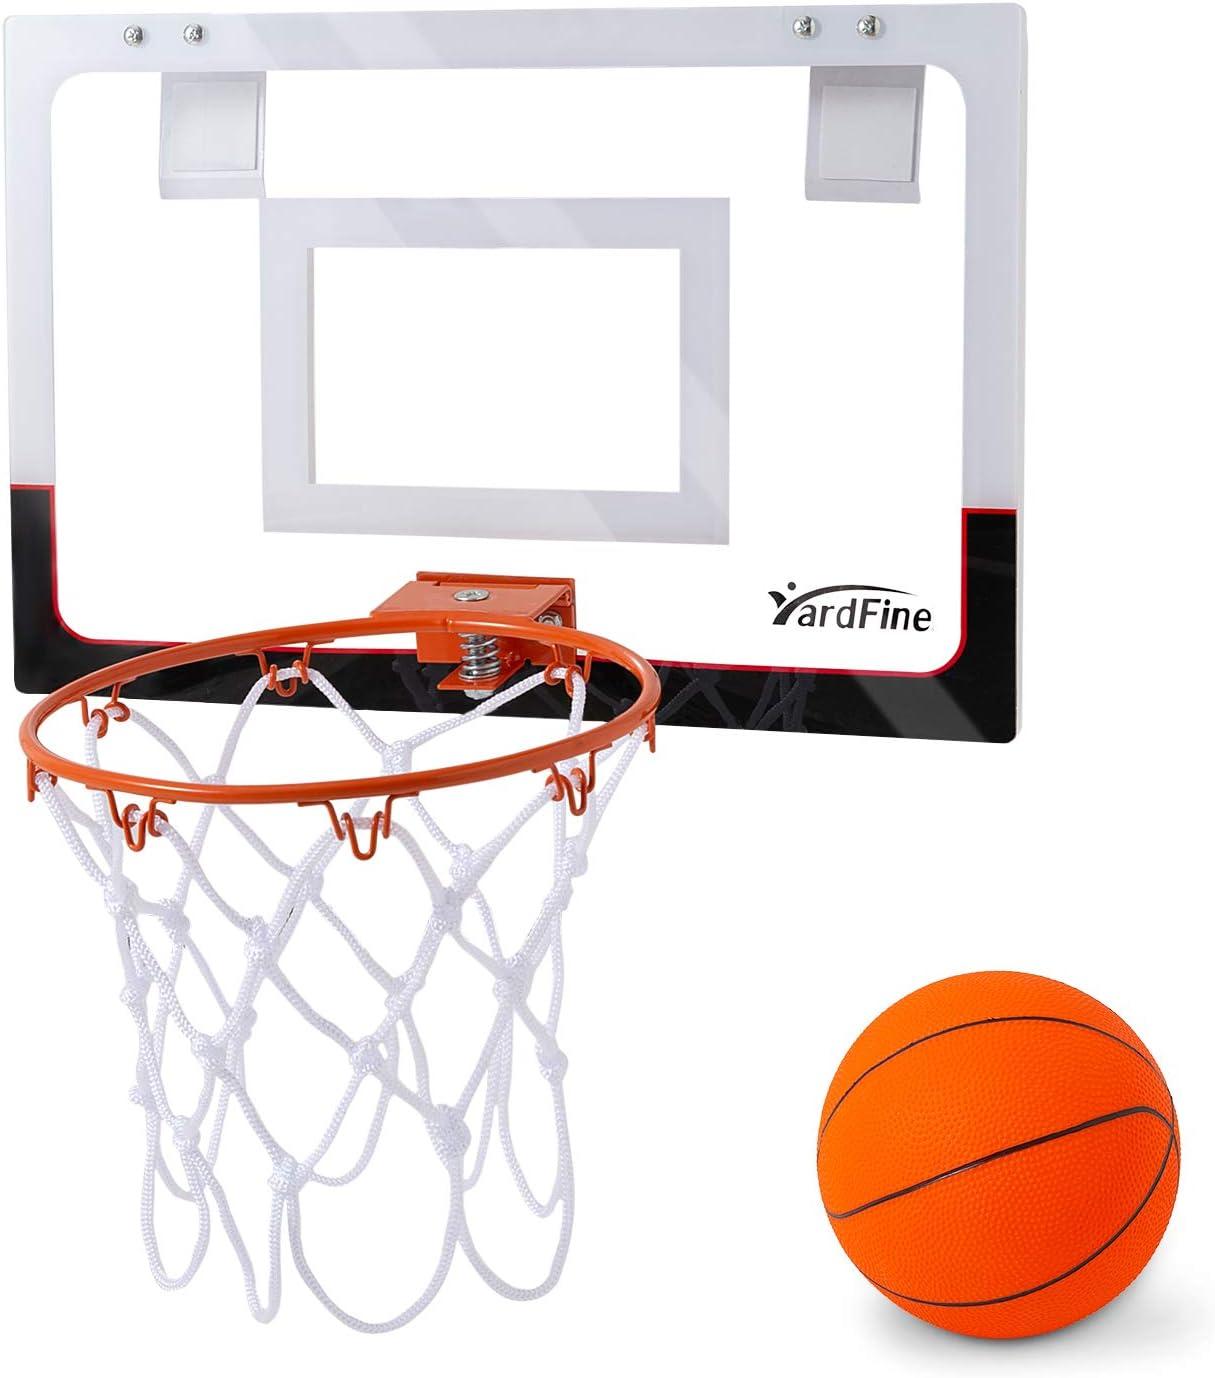 YardFine Mini Basketball Hoop Over The Door with Premium Basketball & Pump Backboard Mini-Hoop Gift for Boys Kids Teens